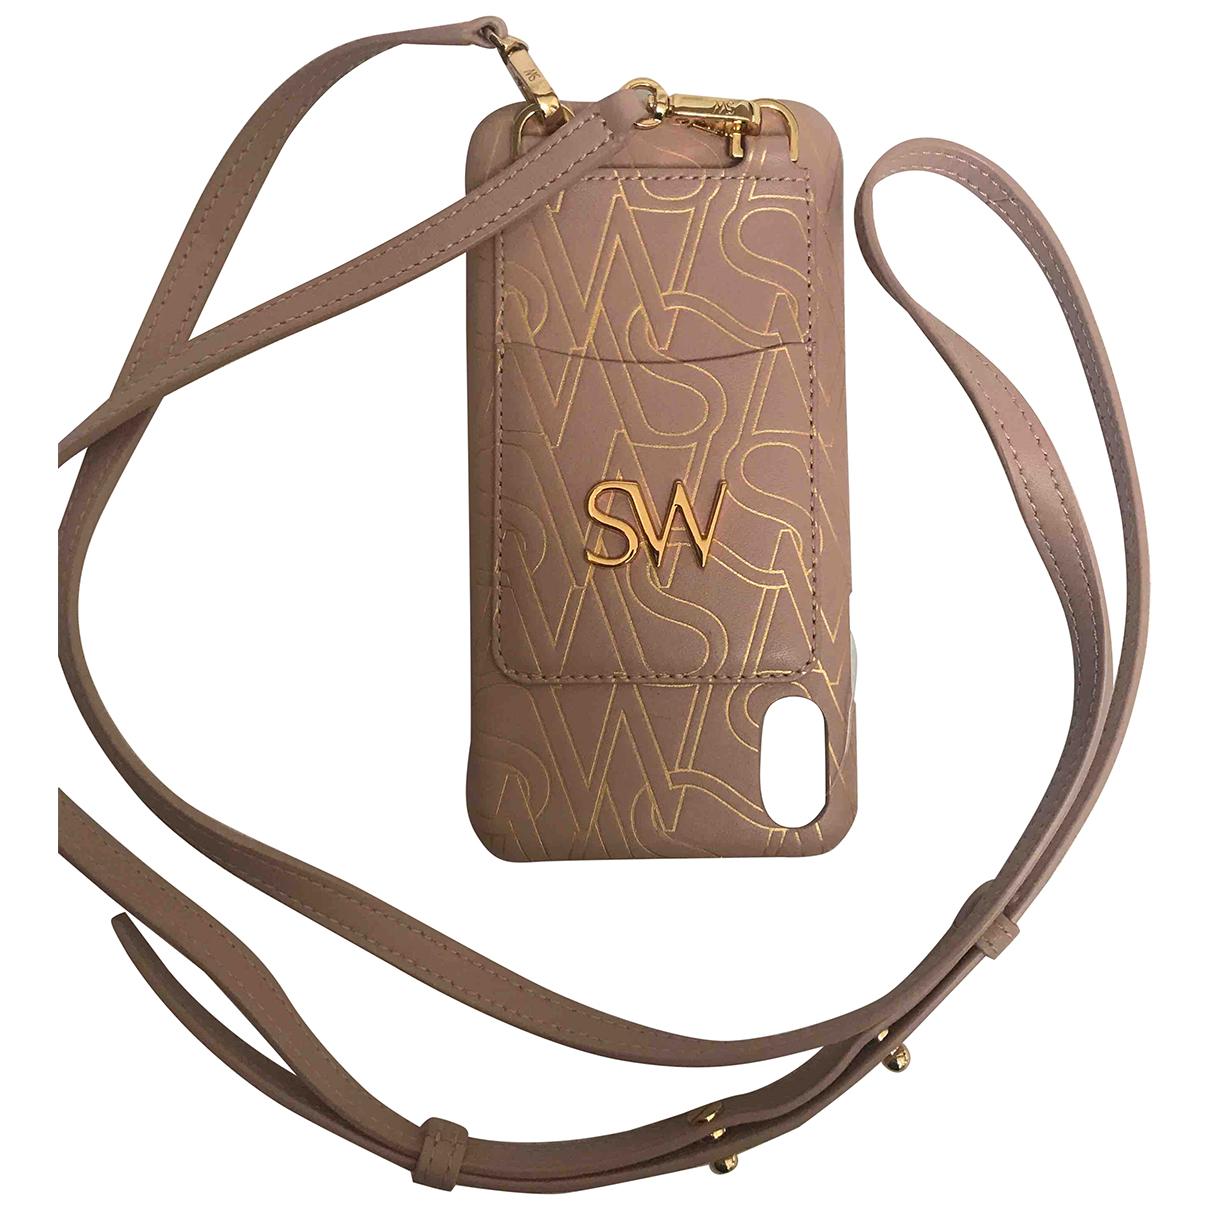 Stuart Weitzman N Pink Leather Purses, wallet & cases for Women N